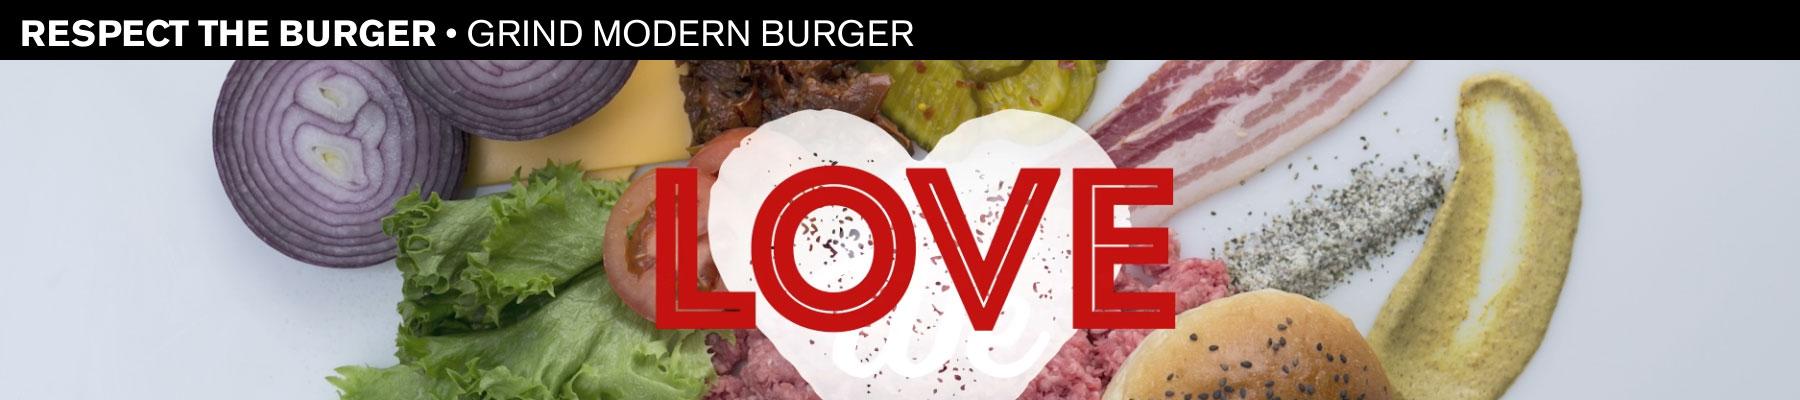 Respect the Burger • Grind Modern Burger